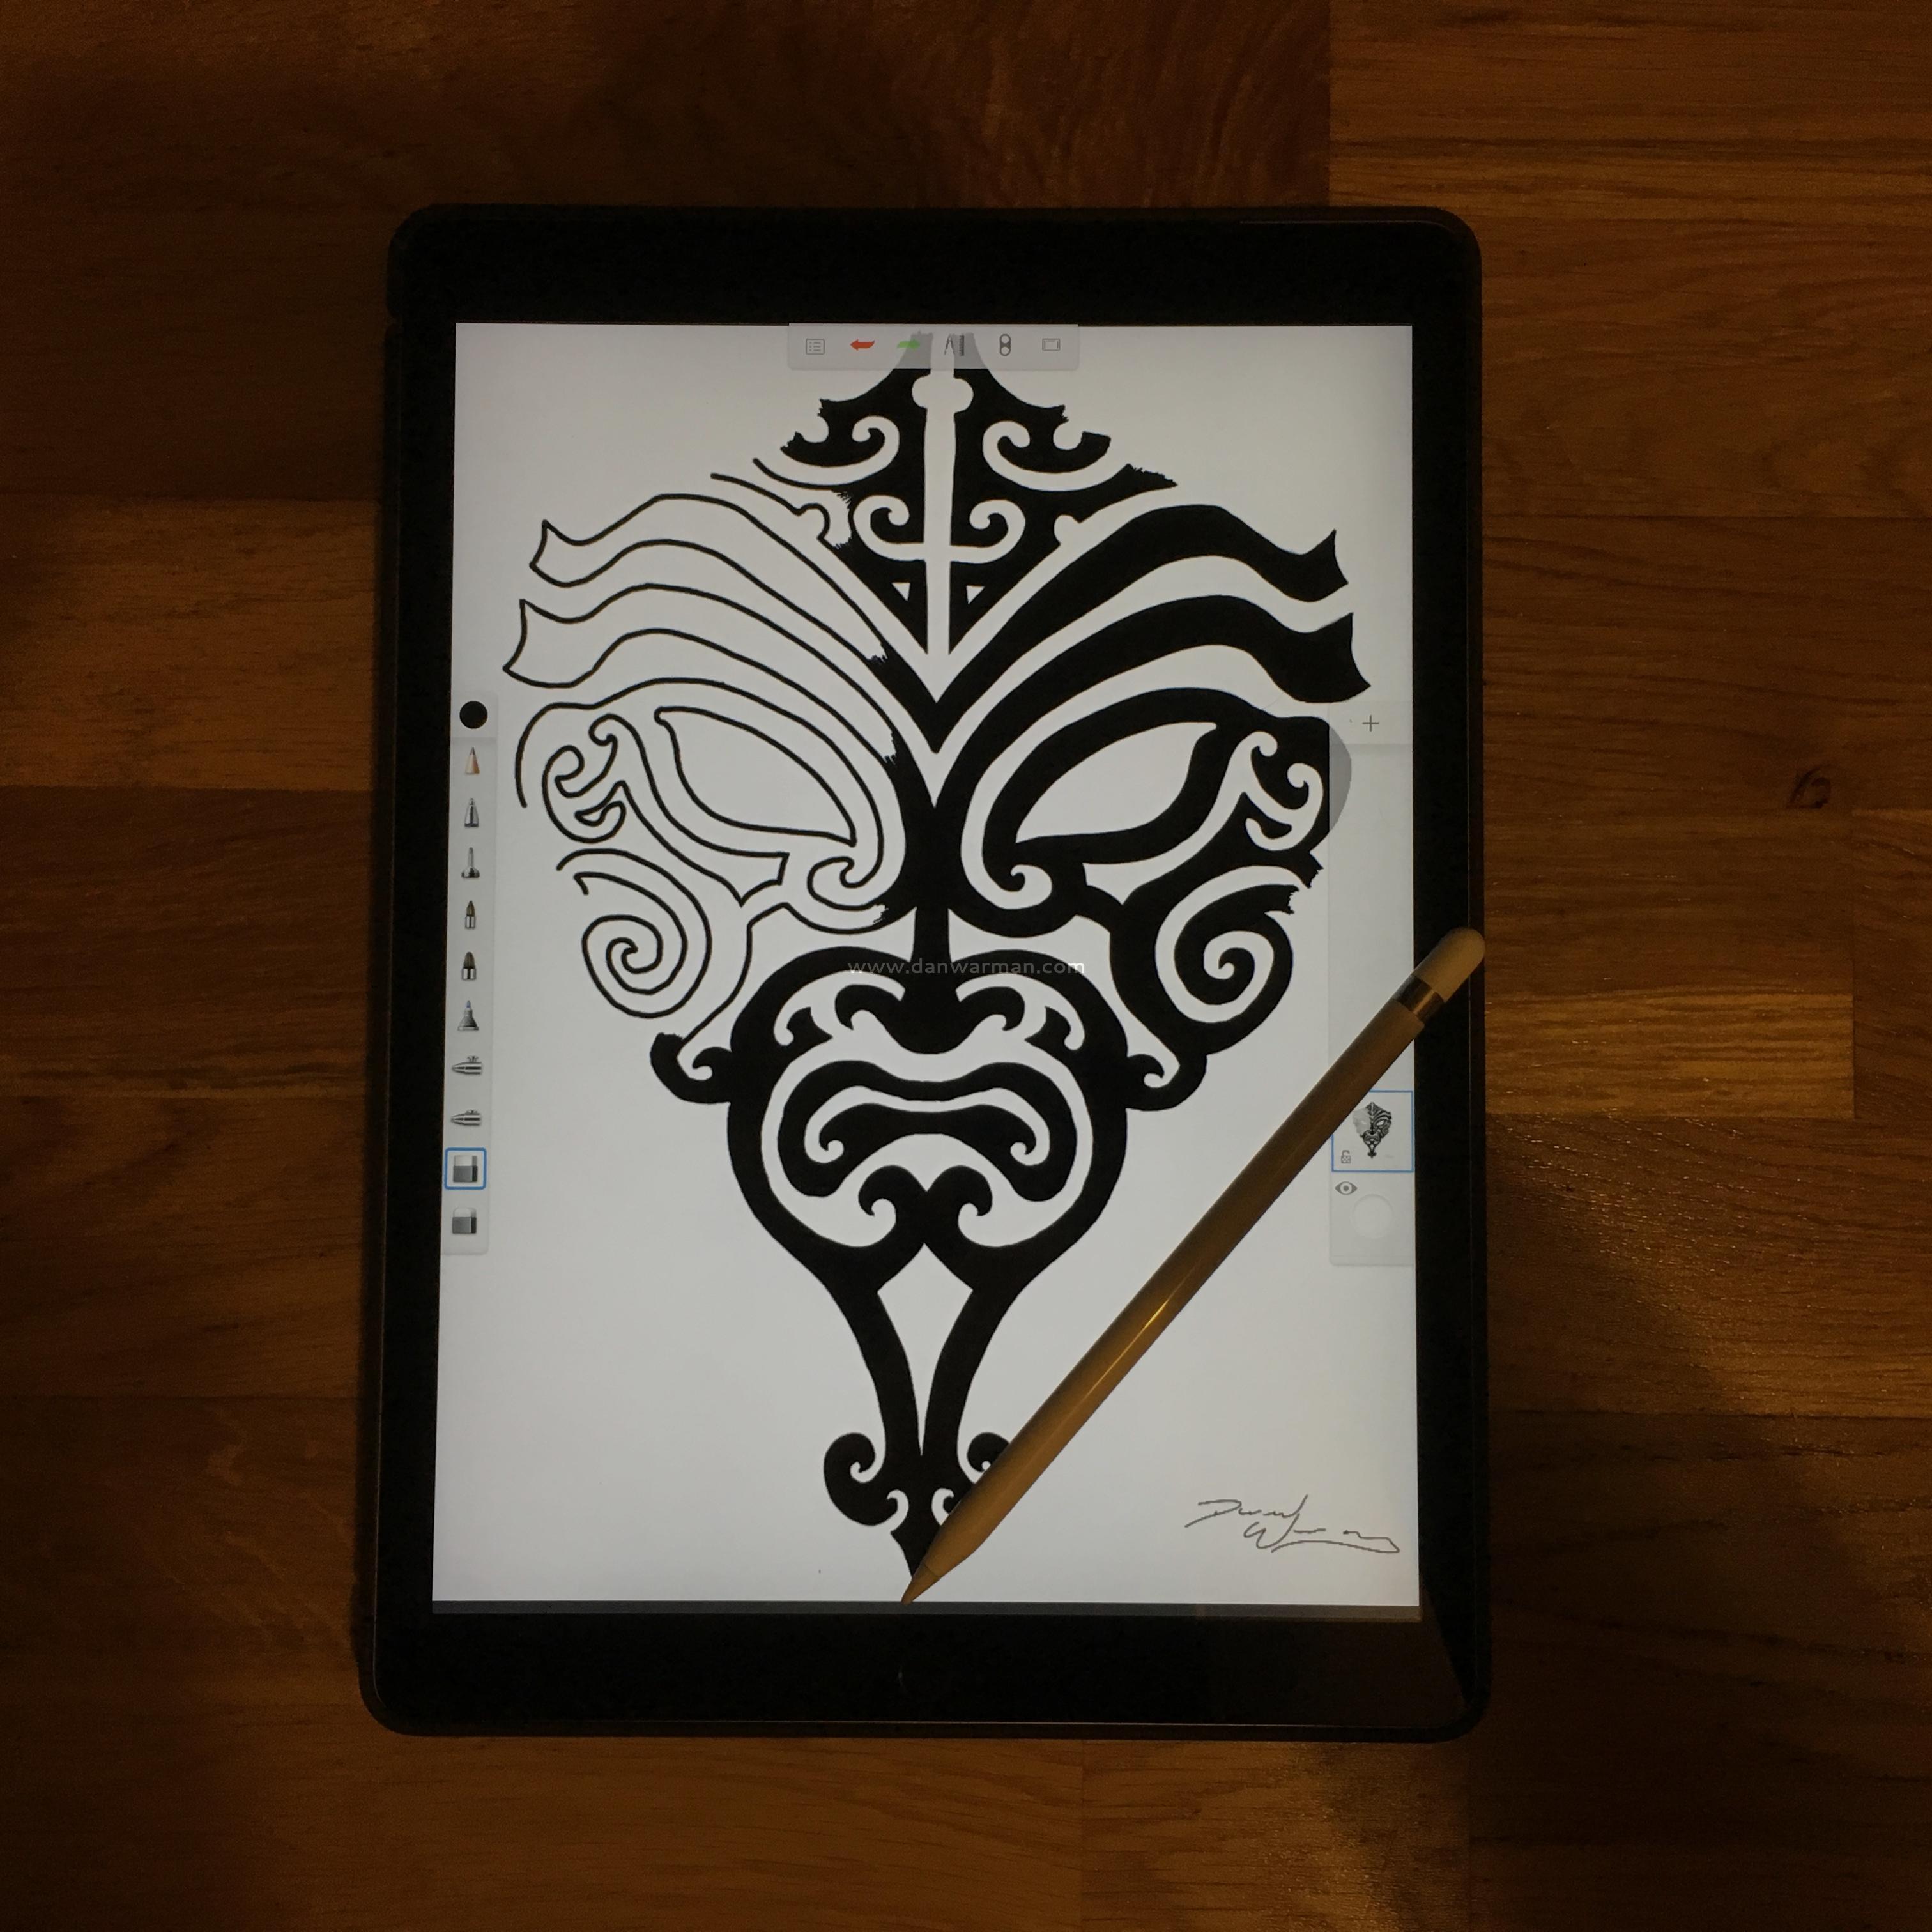 Apple iPad Pro and Pencil Sketch